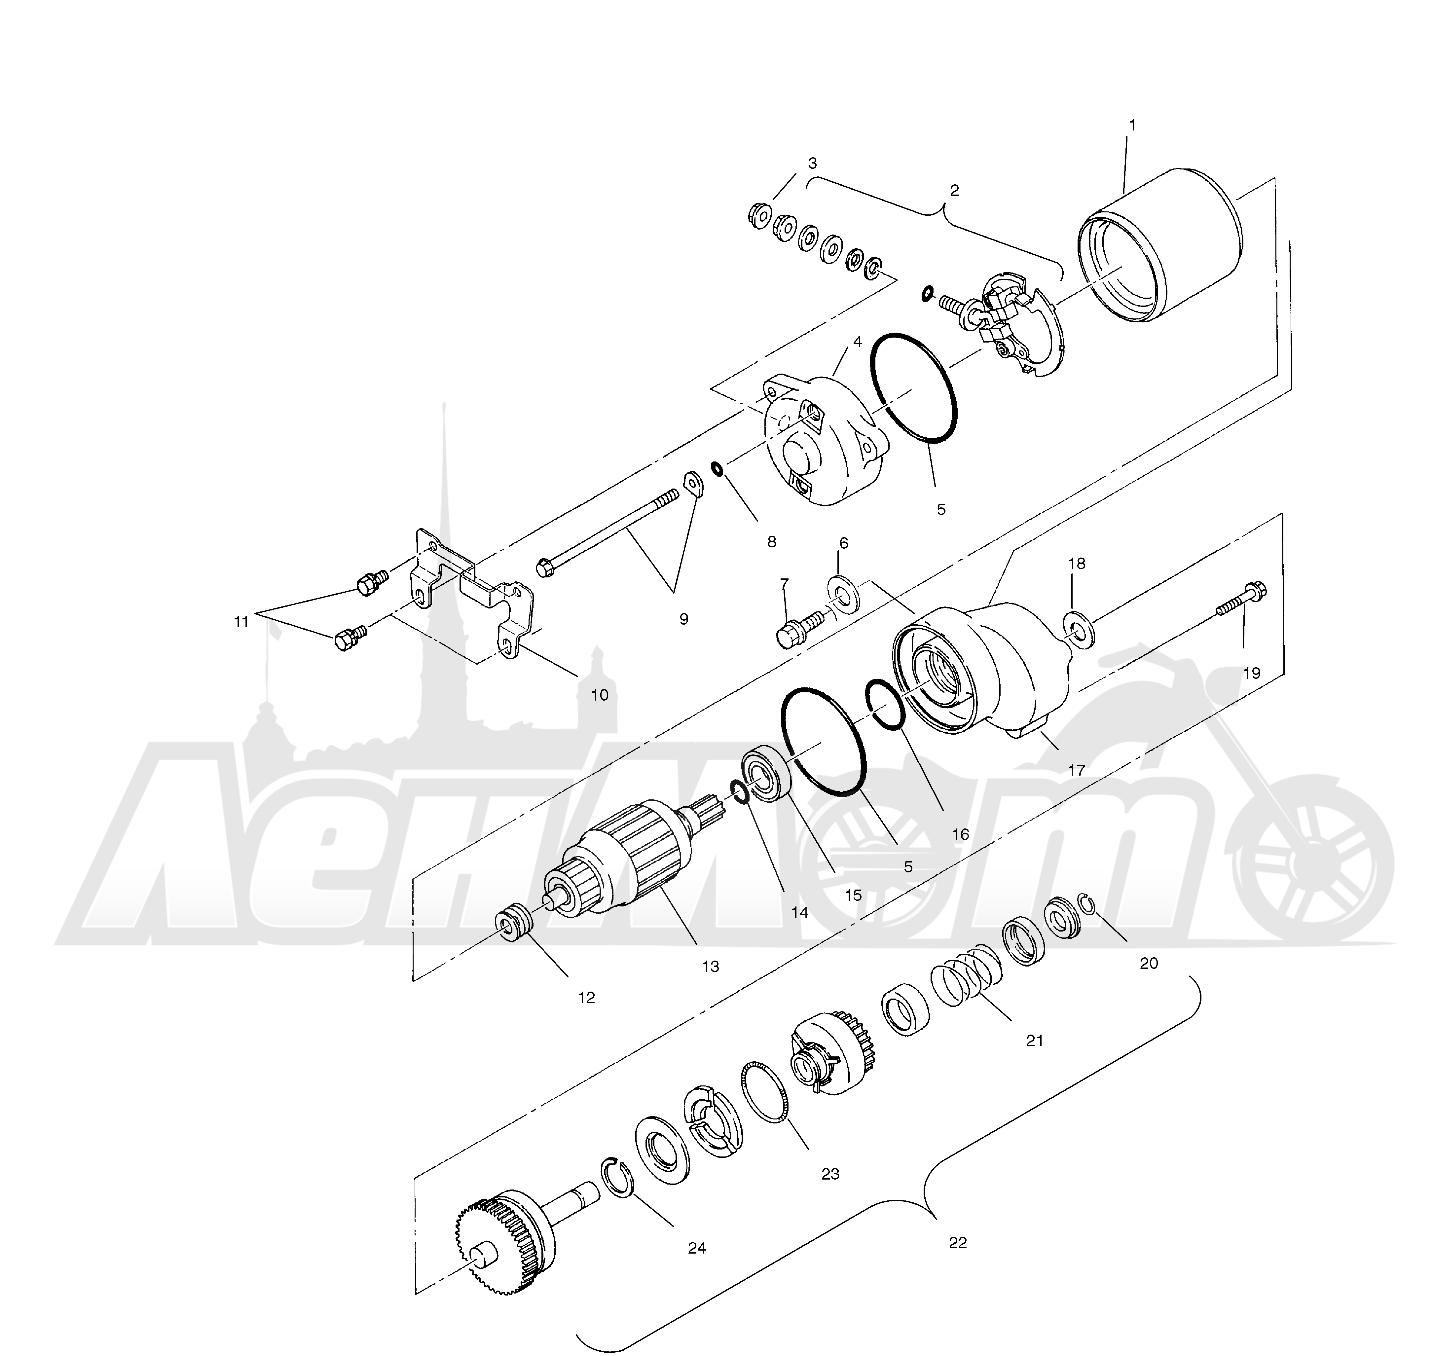 Запчасти для Квадроцикла Polaris 1996 SPORT 400L - W968540 Раздел: STARTING MOTOR (BLAZER) - W967827 | электростартер (BLAZER) W967827